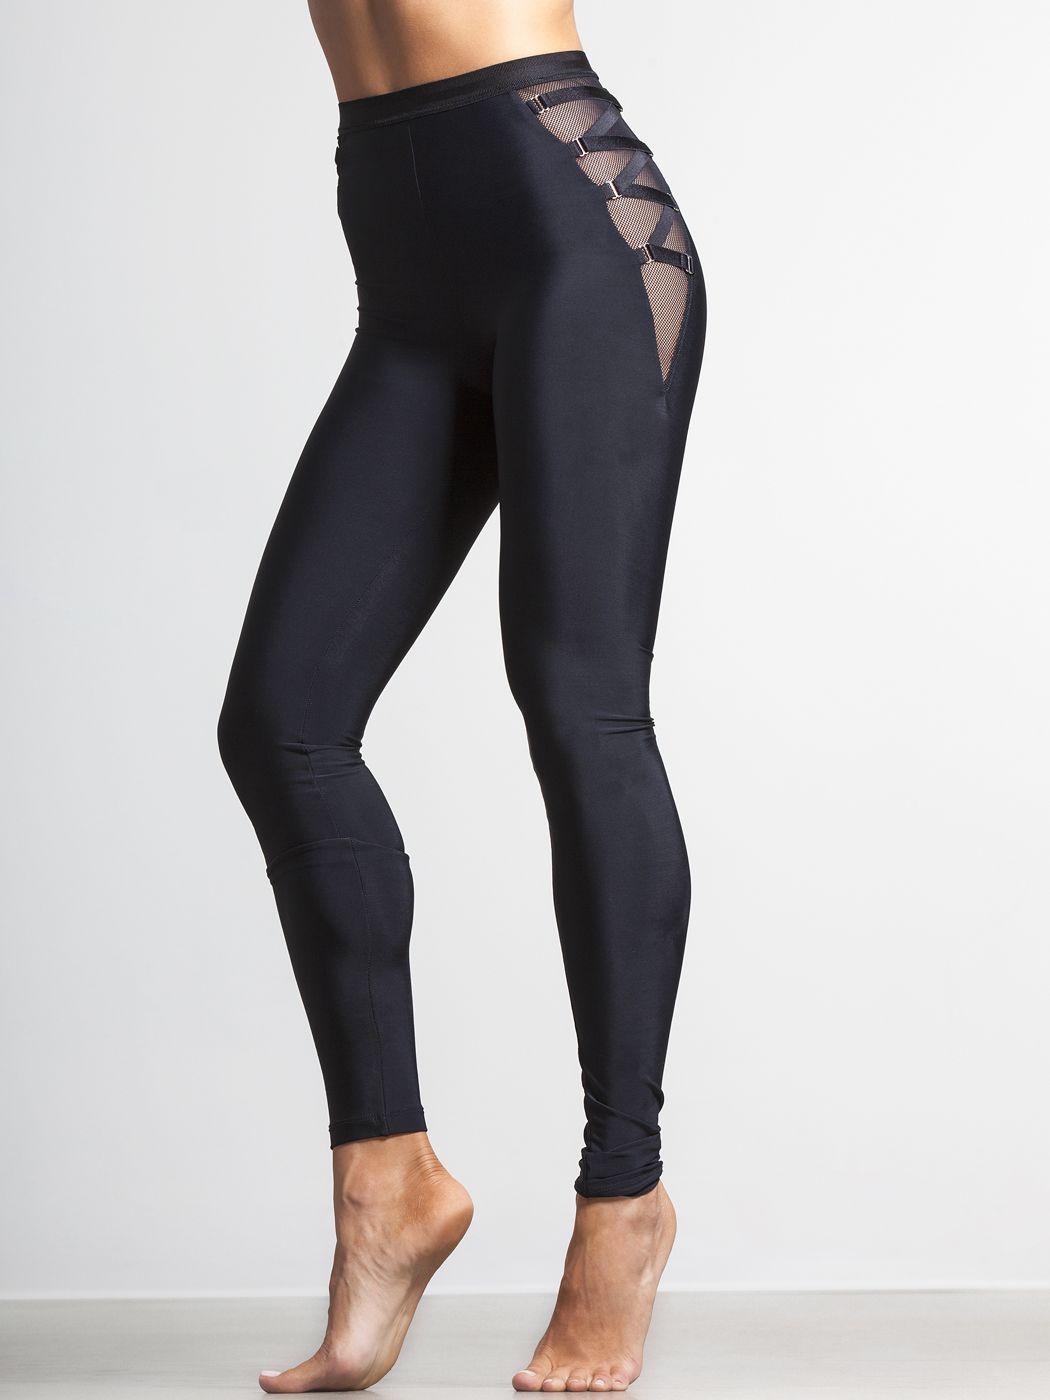 Active Life Womens Size Medium Cross Strap Yoga Activewear Leggings Pant Black